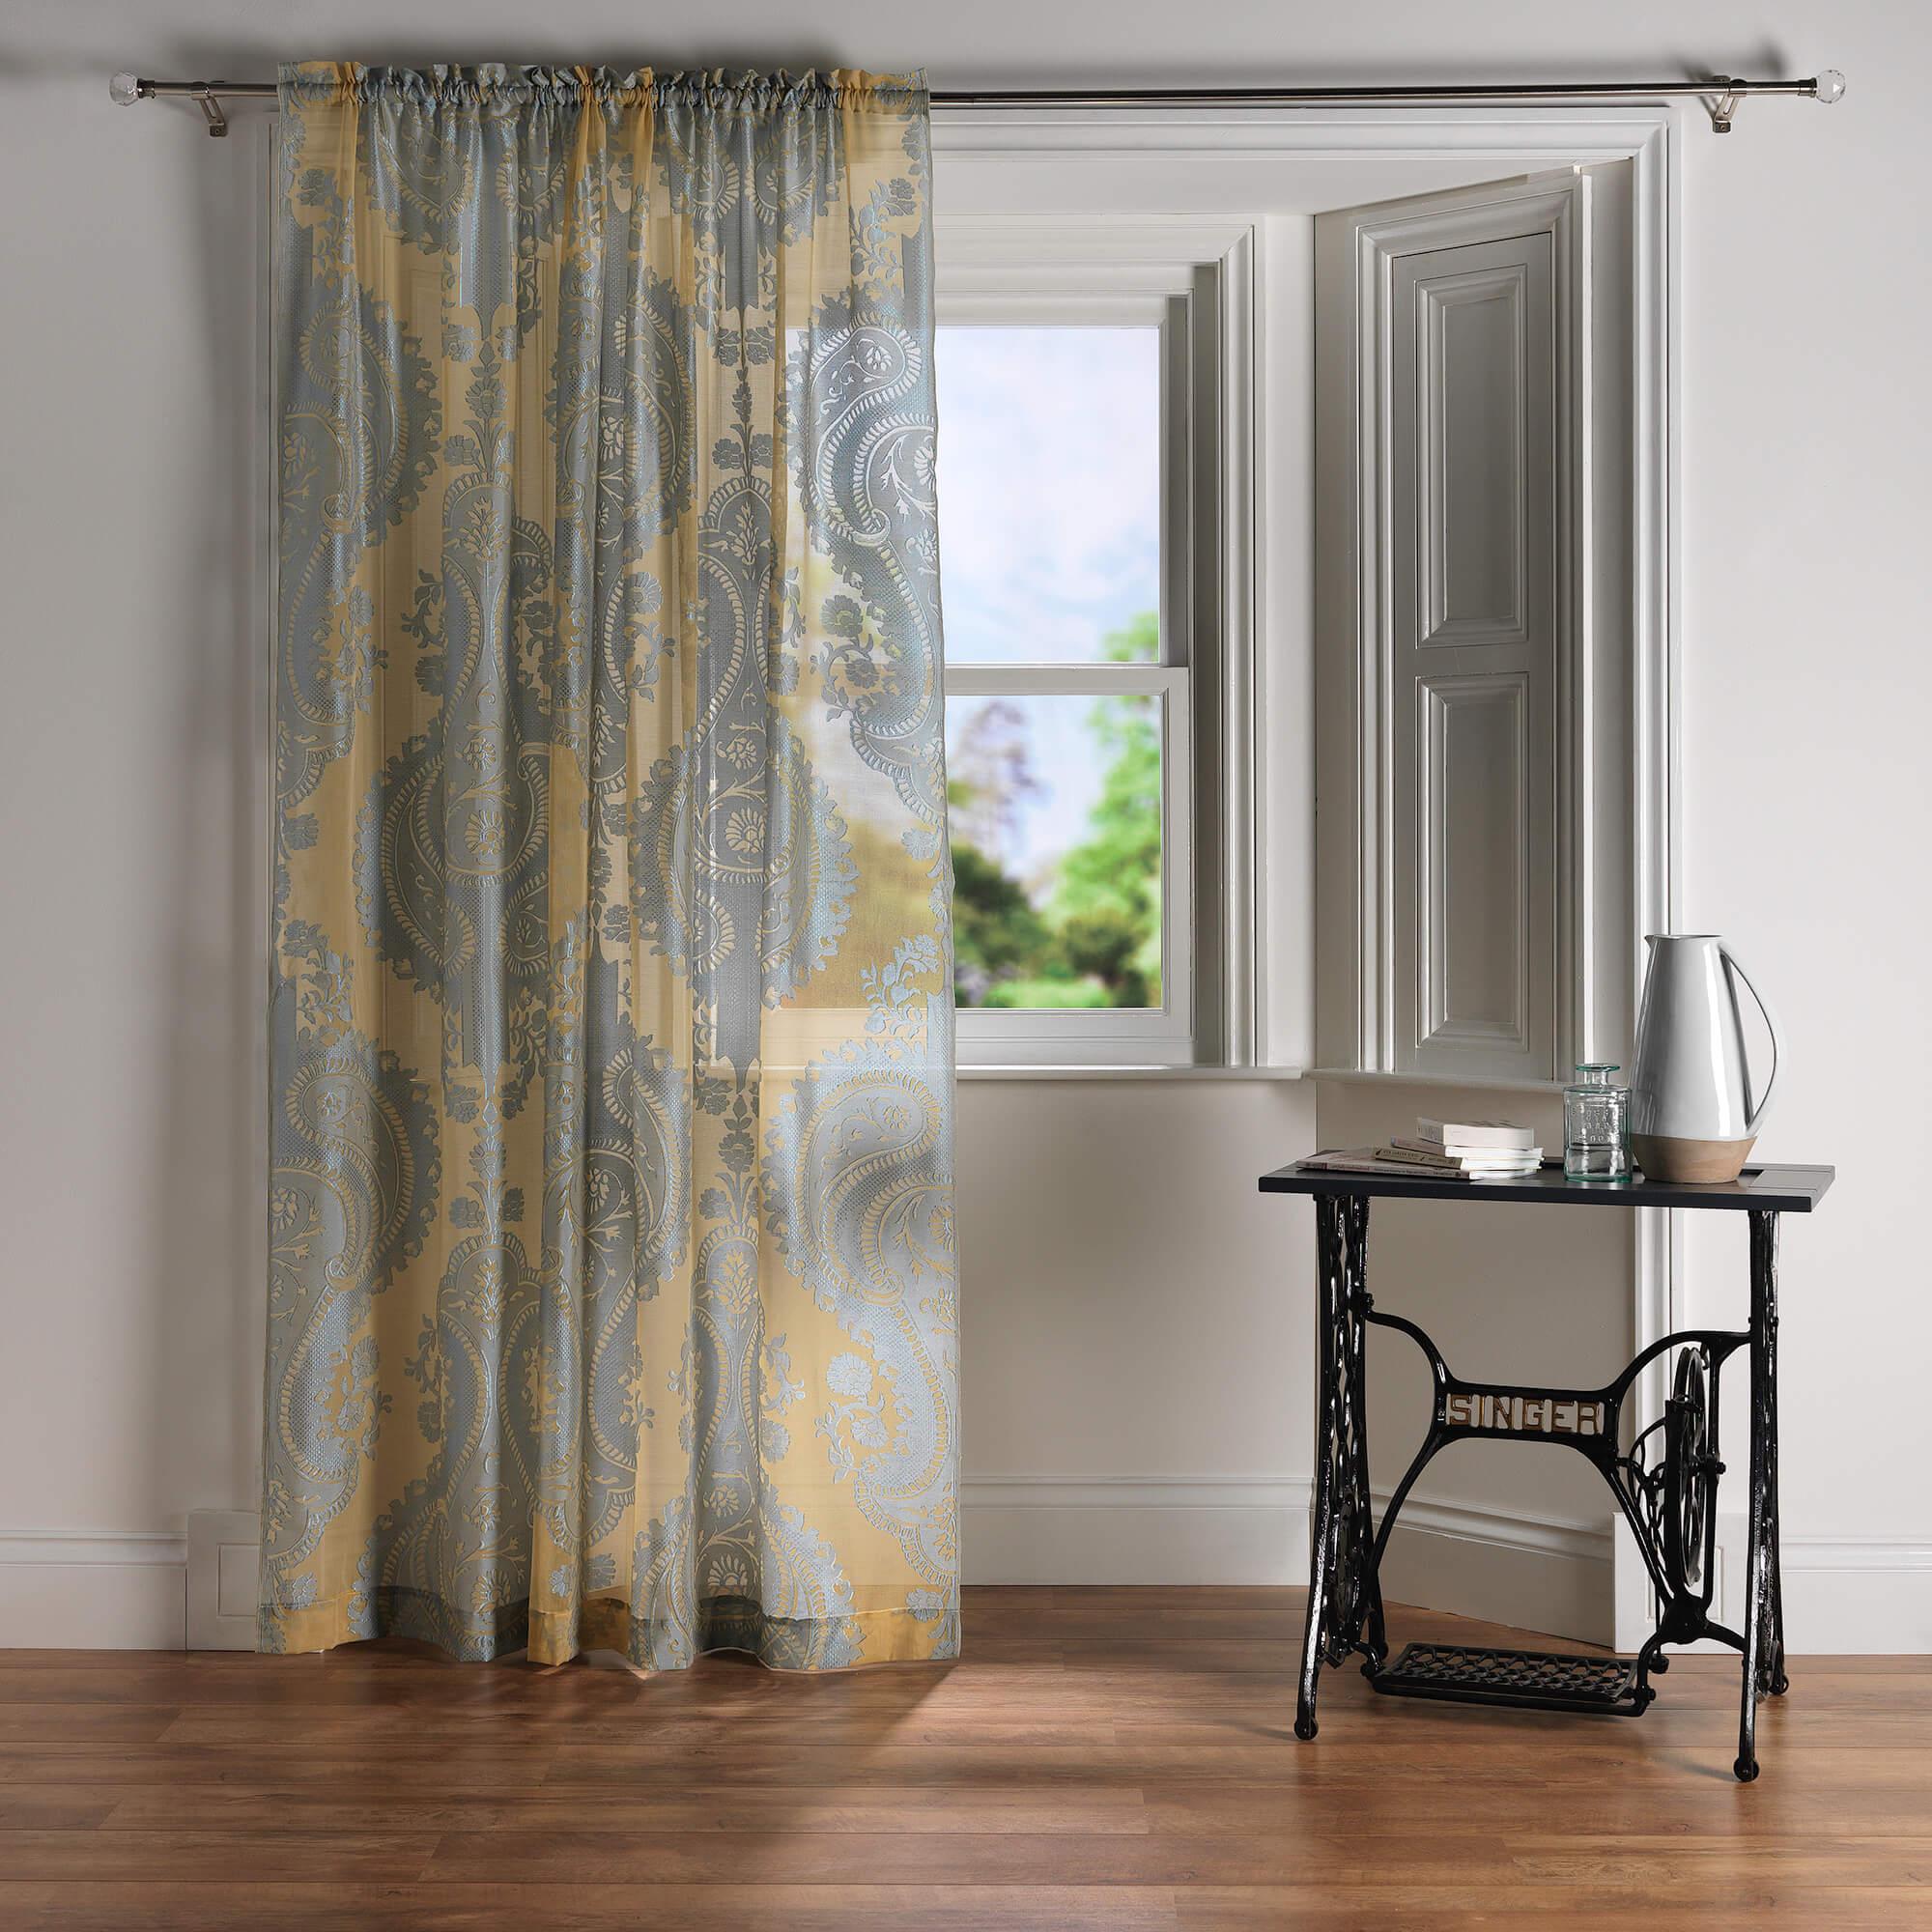 Fixing net curtains bay windows for Window net curtain